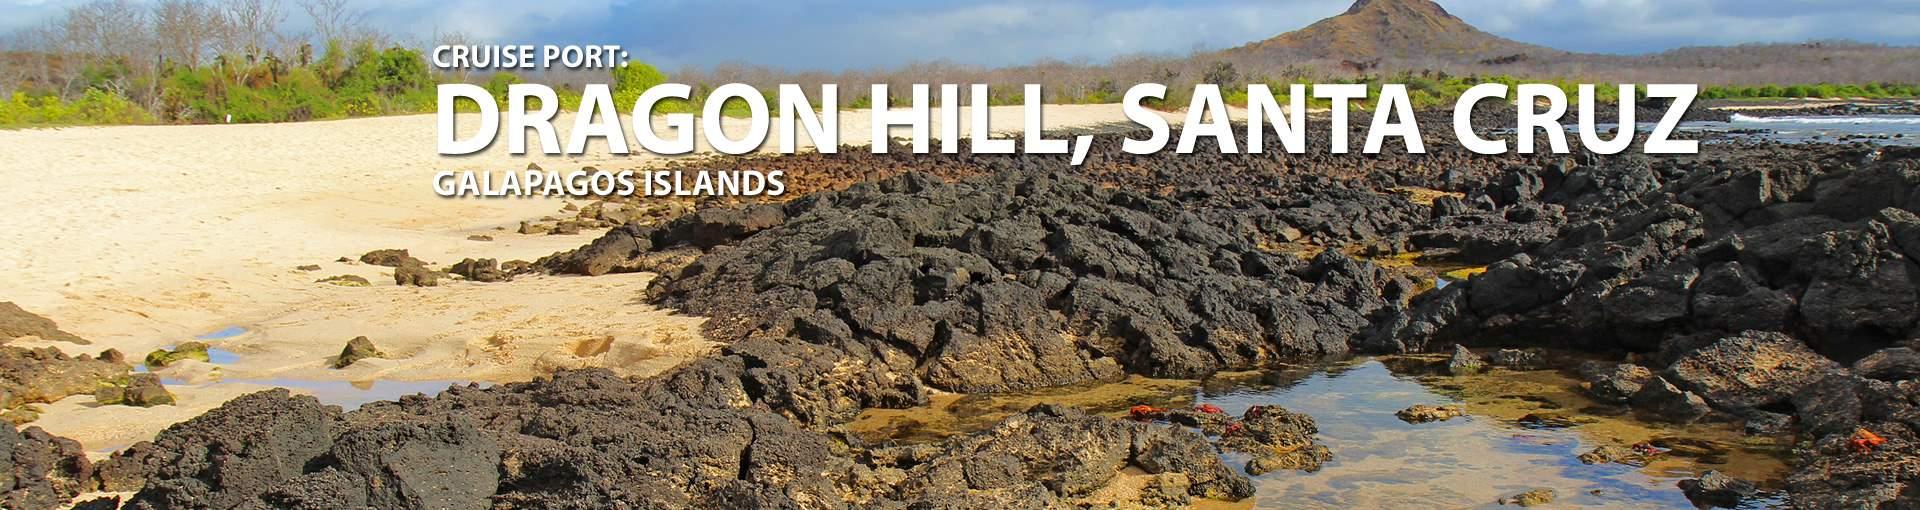 Cruise to Dragon Hill (Santa Cruz), Galapagos